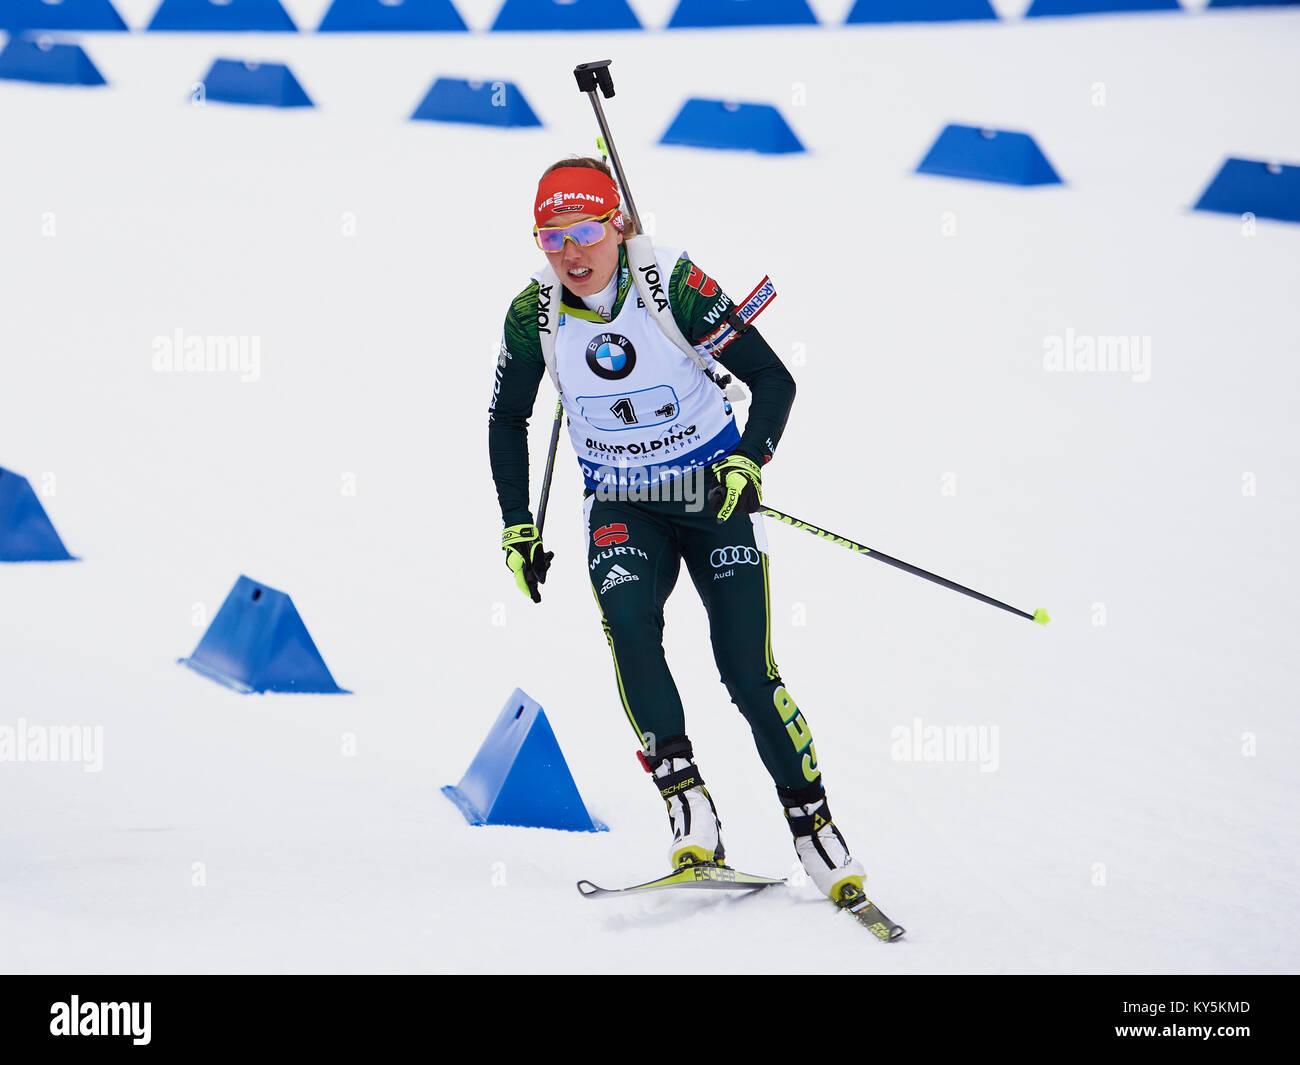 Ruhpolding, Deutschland. 12 Jan, 2018. Laura DAHLMEIER (GER) Frau Relais, IBU Biathlon Weltcup, Wm, Chiemgau Arena Stockbild